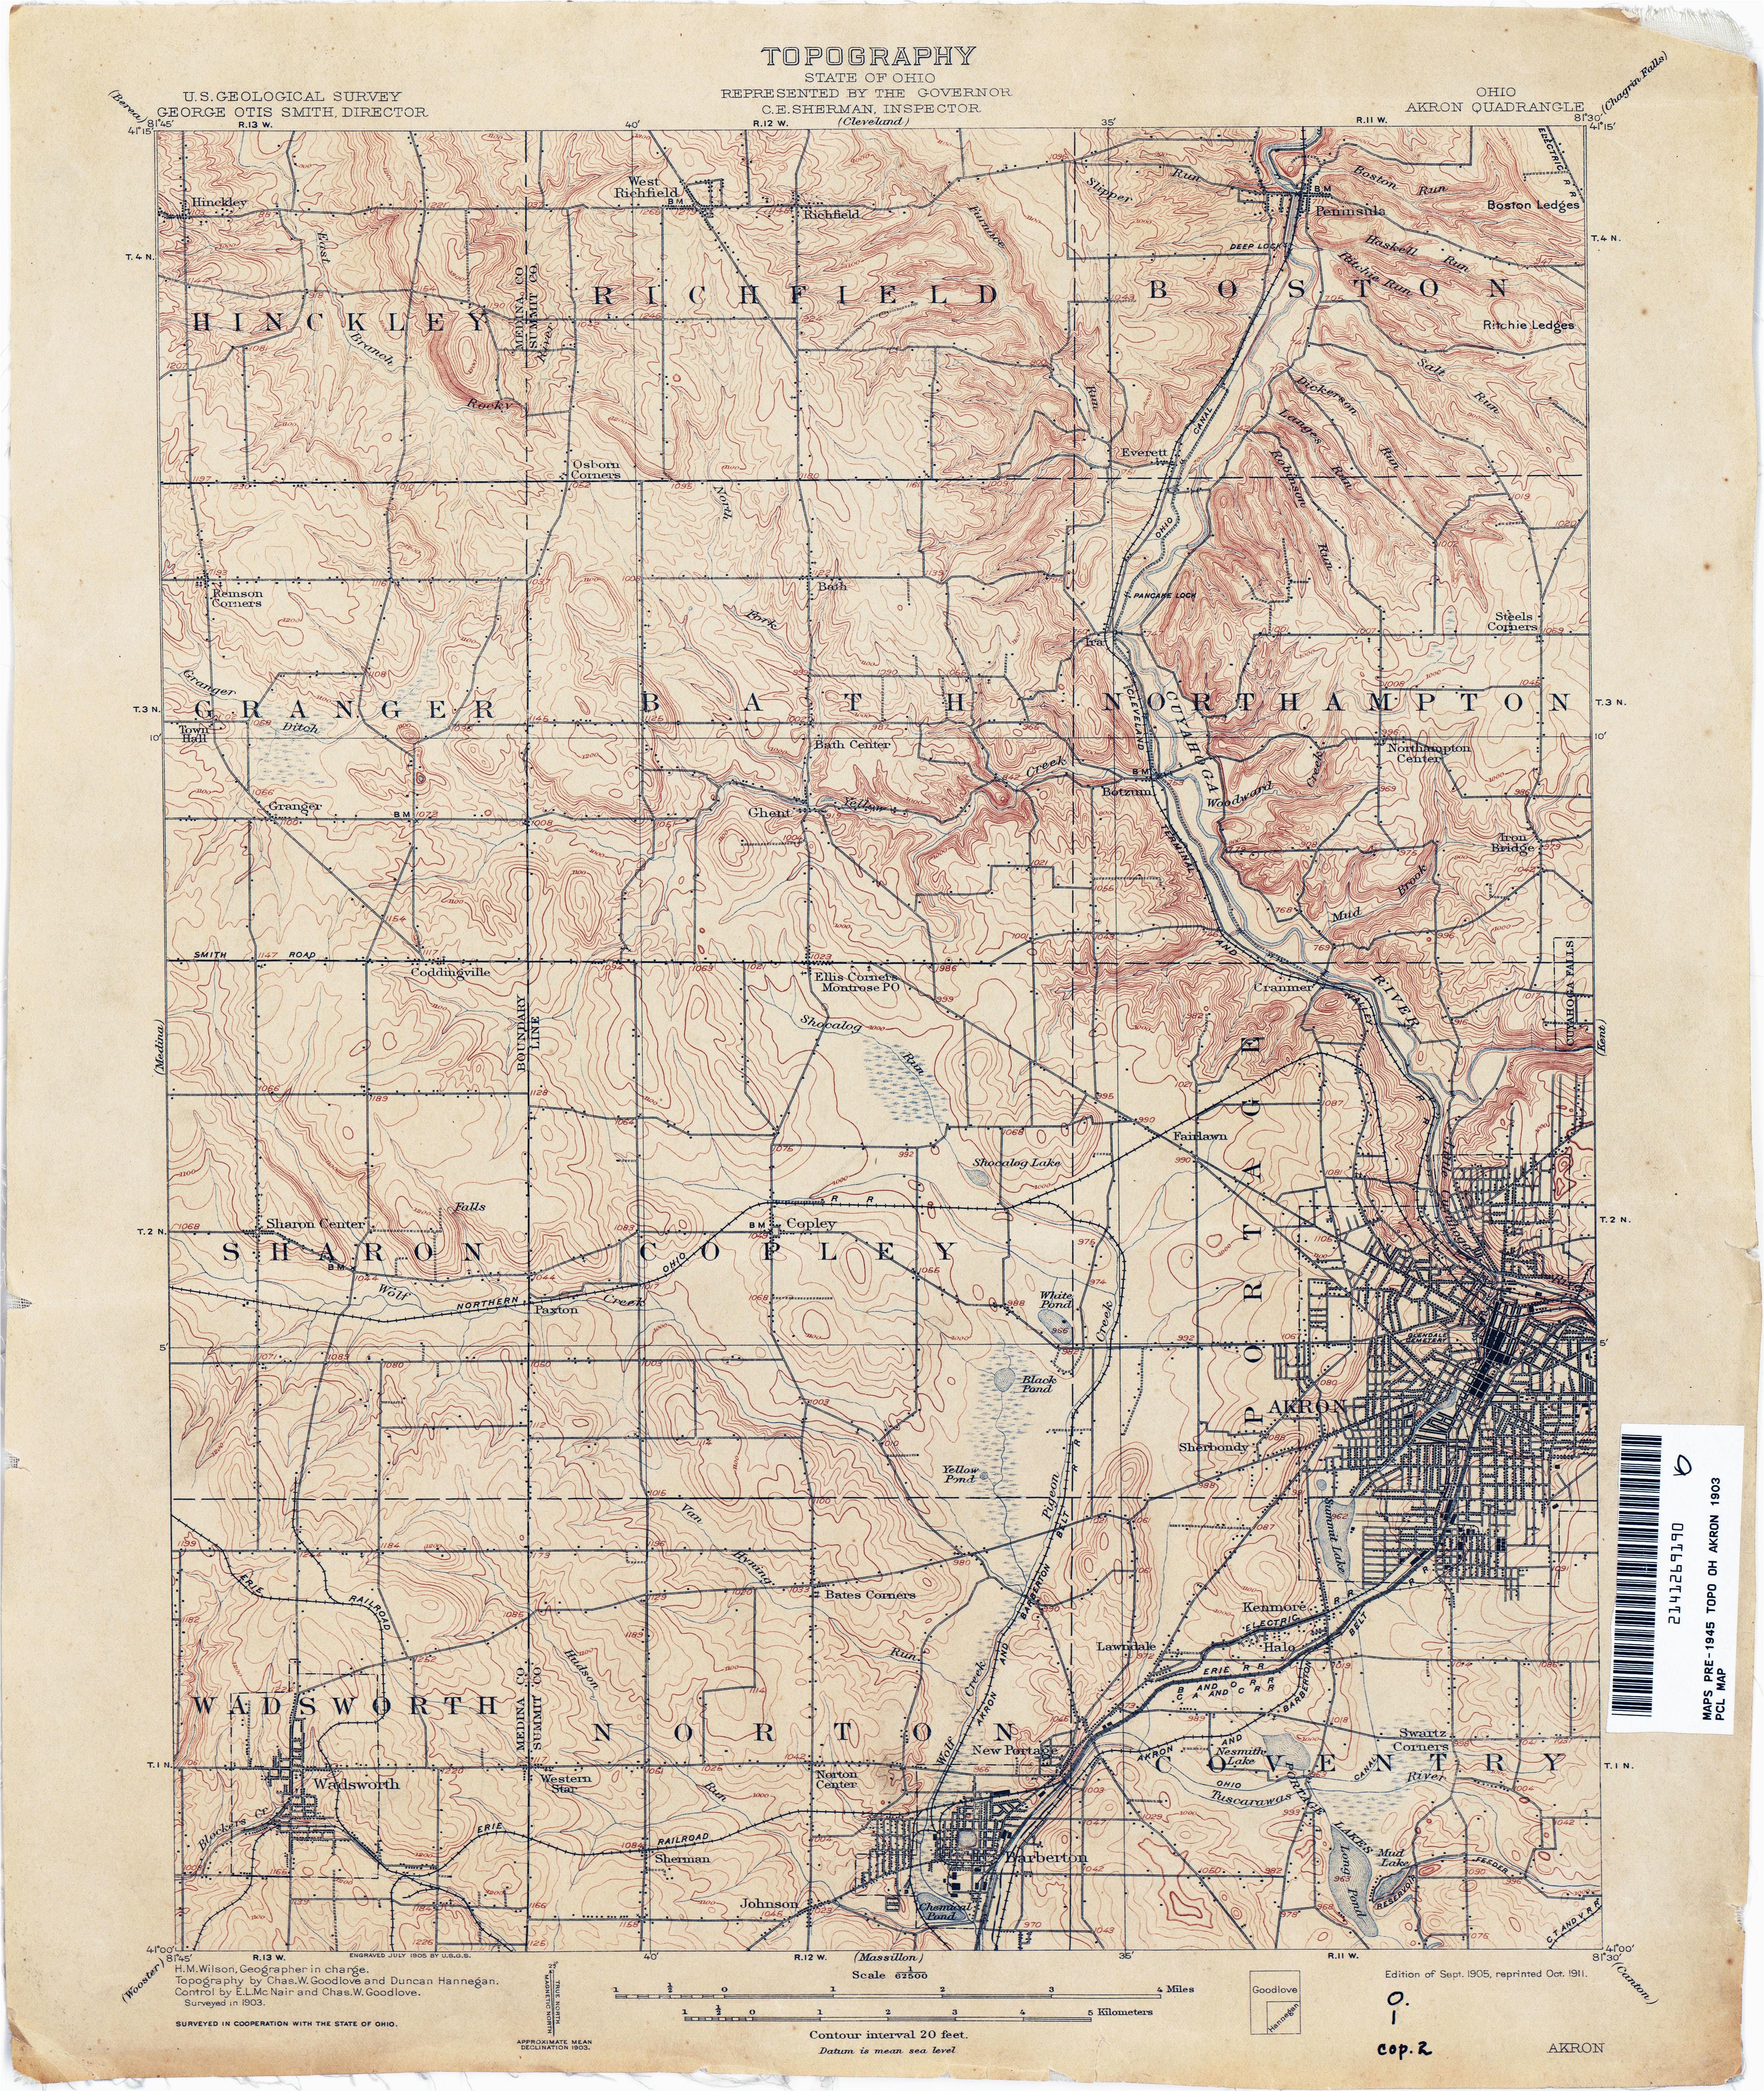 Ohio topo Maps Free | secretmuseum